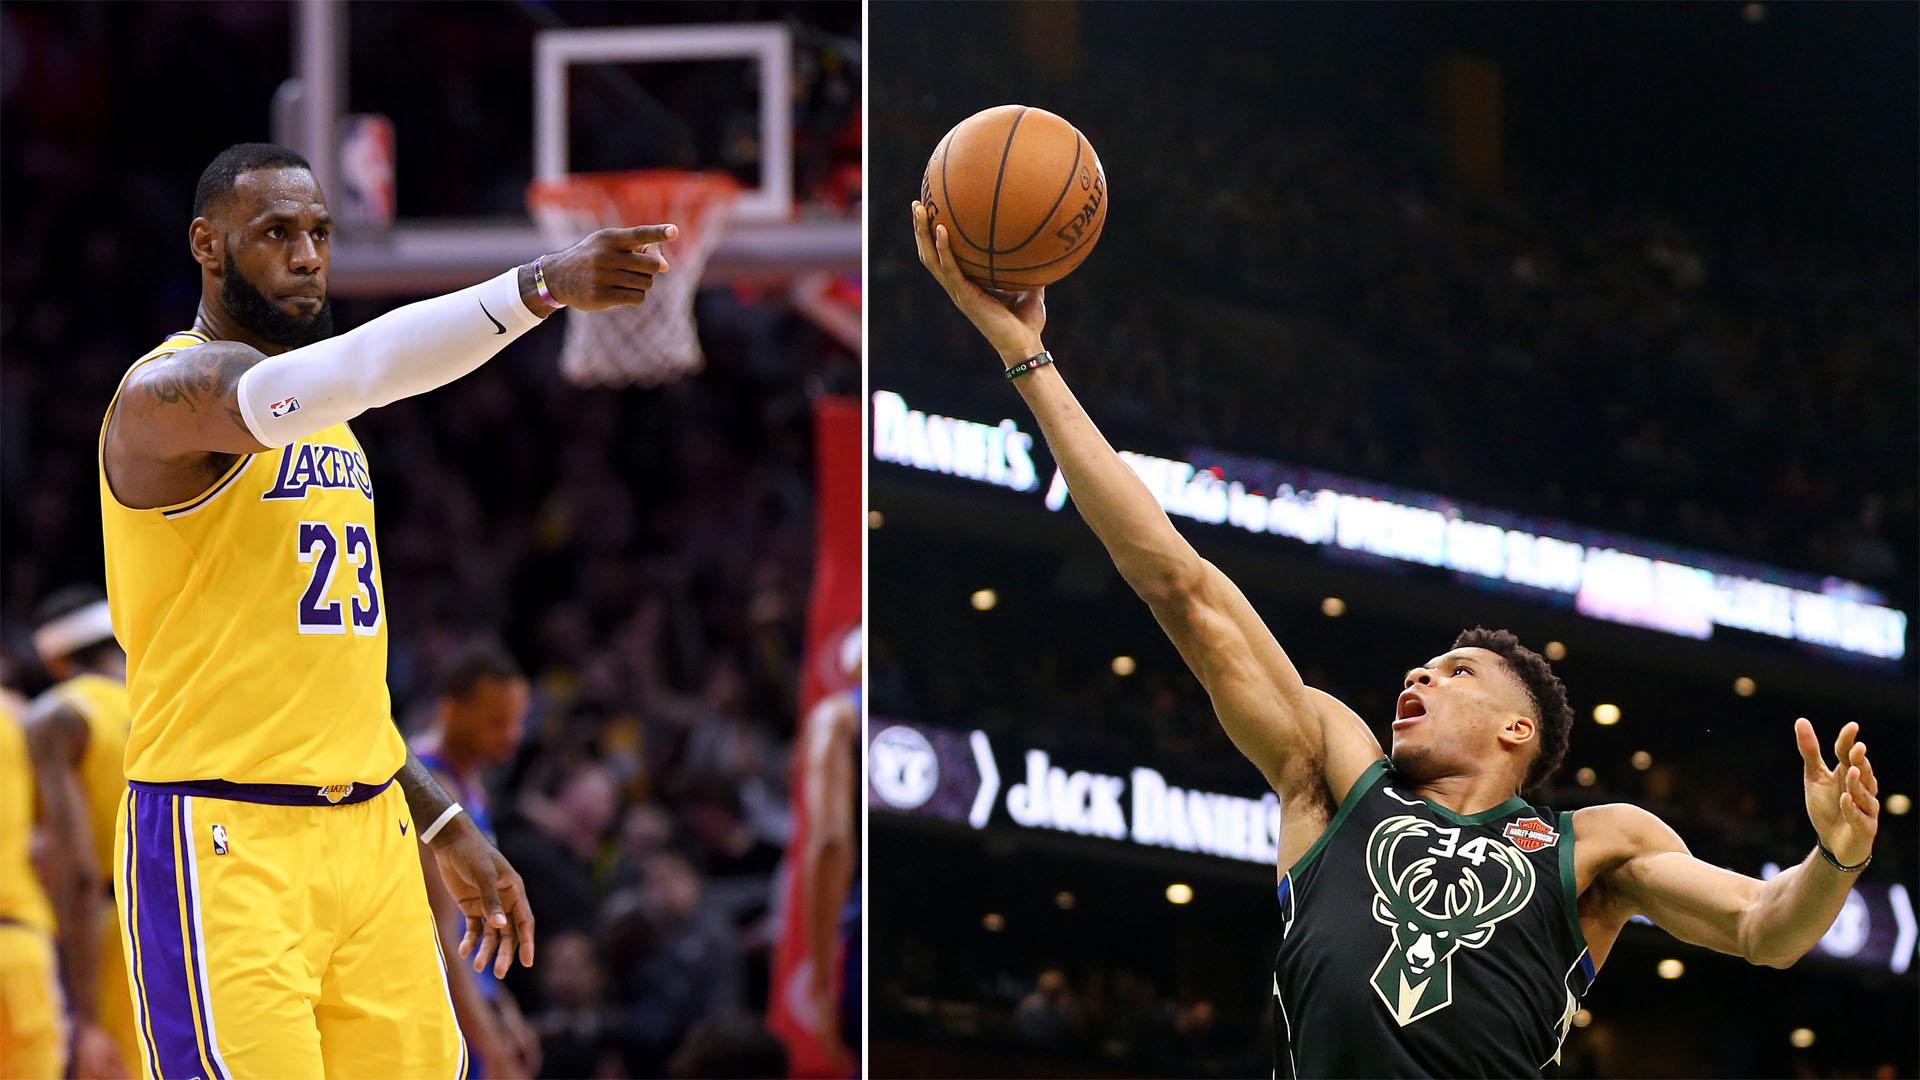 NBA All-Star 2019: Team LeBron vs. Team Giannis by the ...